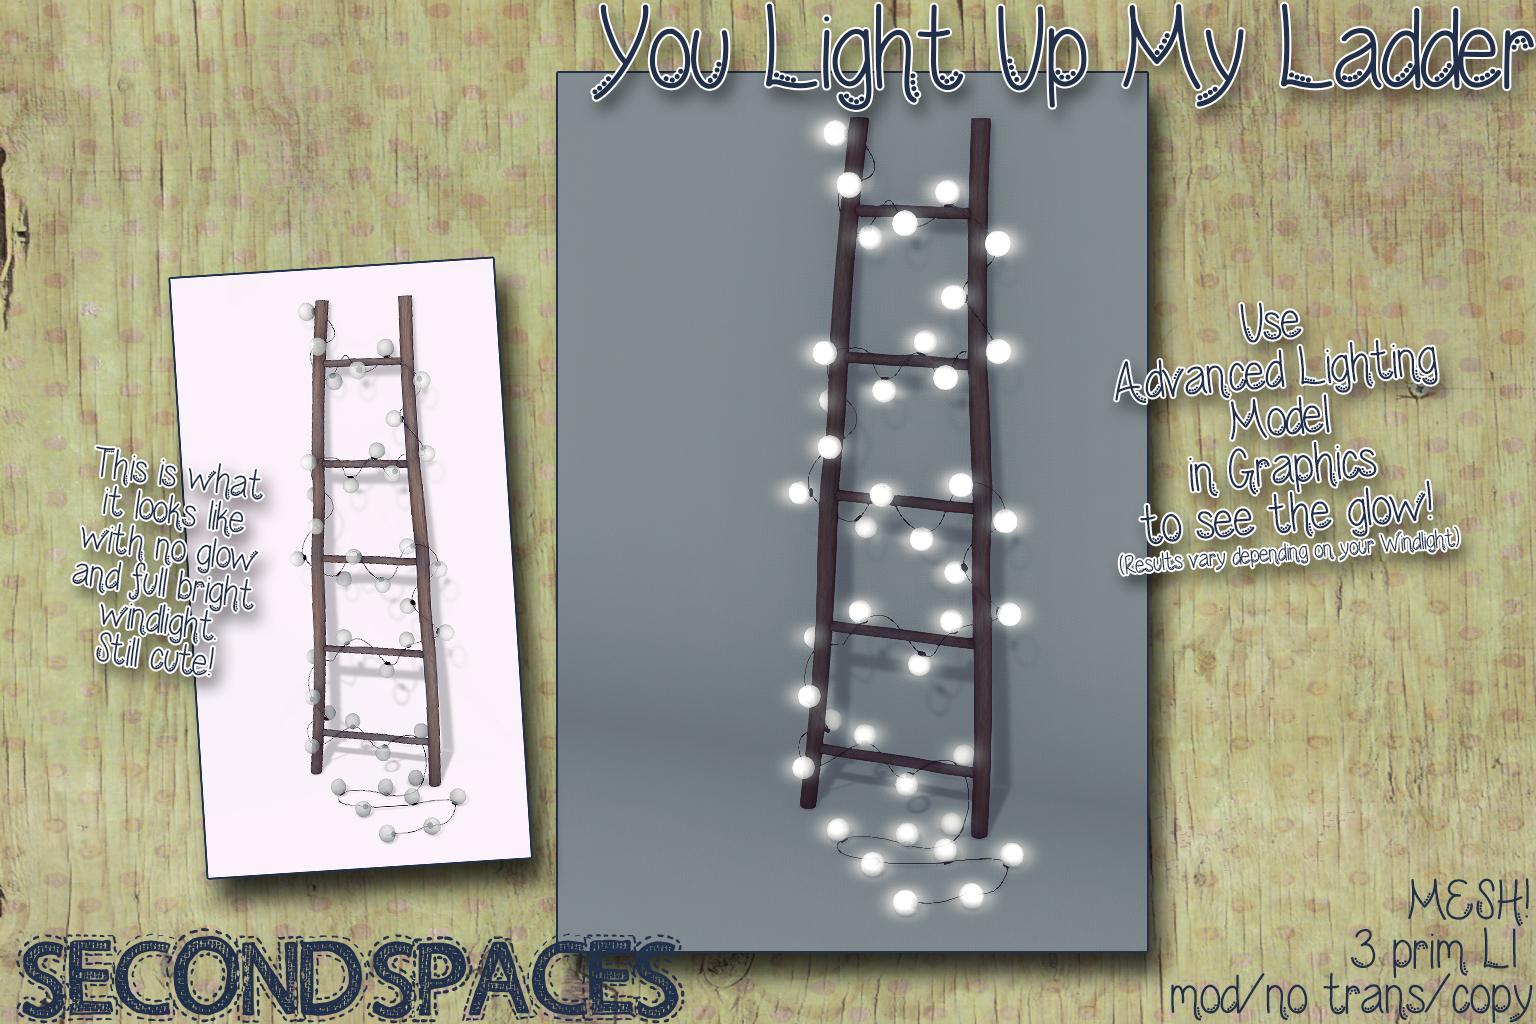 lighted ladder_vendor.jpg